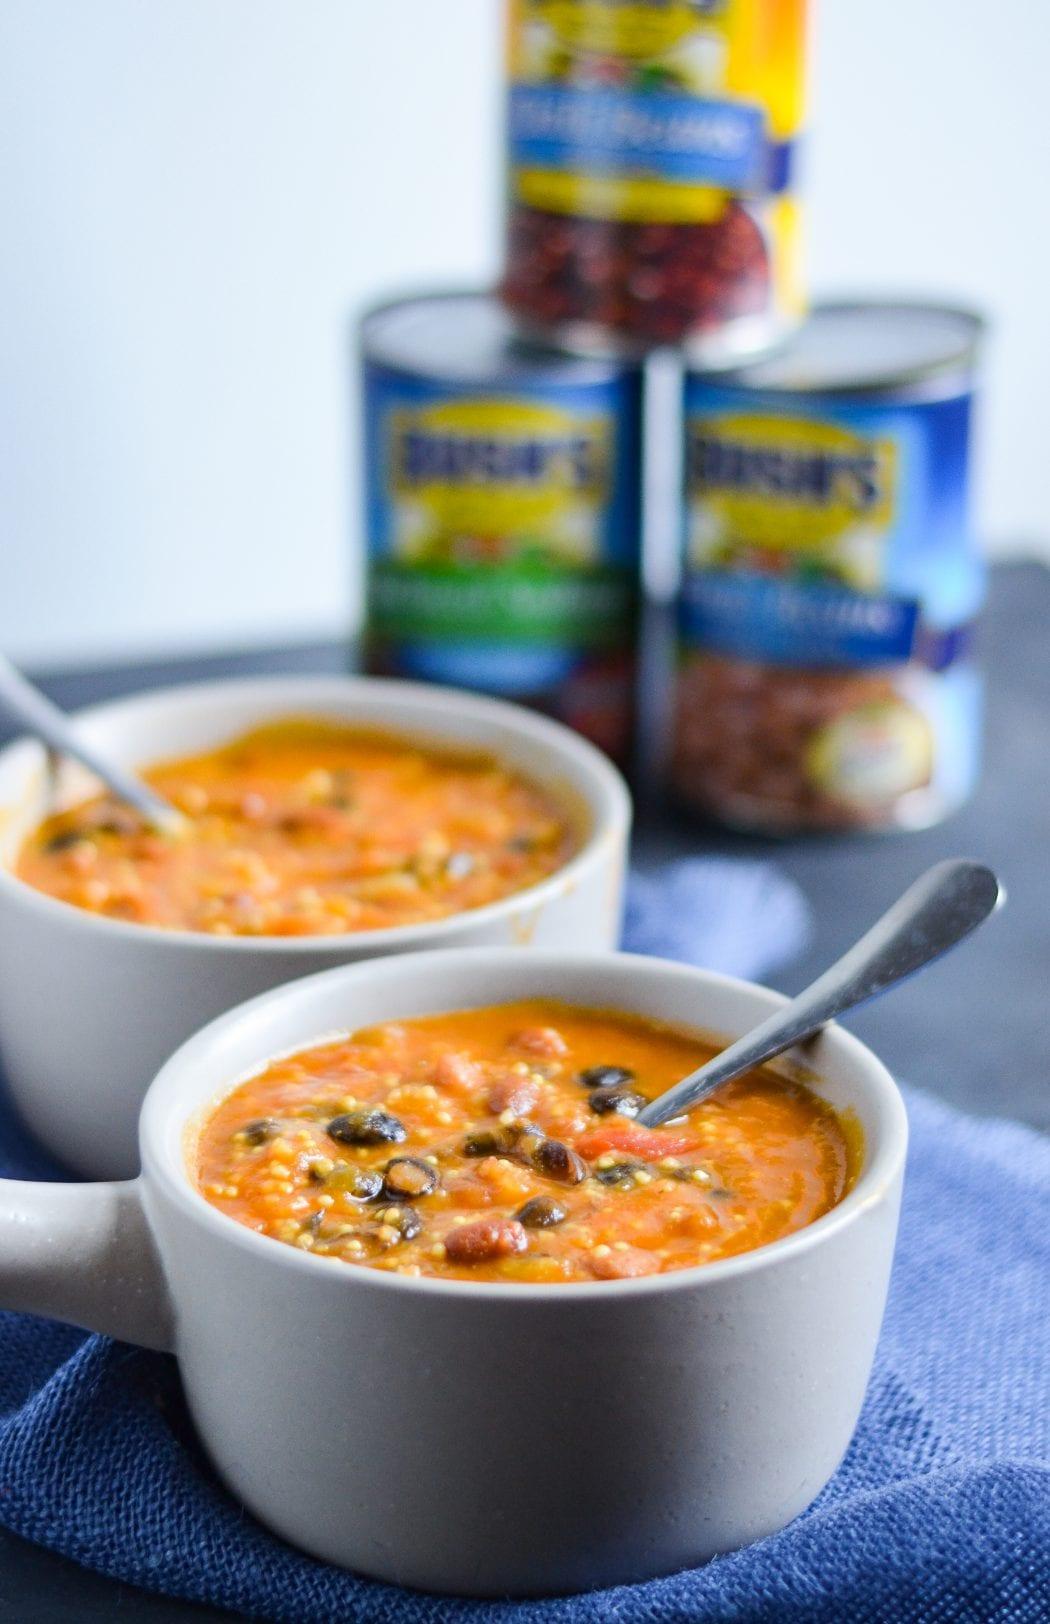 Vegetarian Butternut Squash and Three Bean Chili